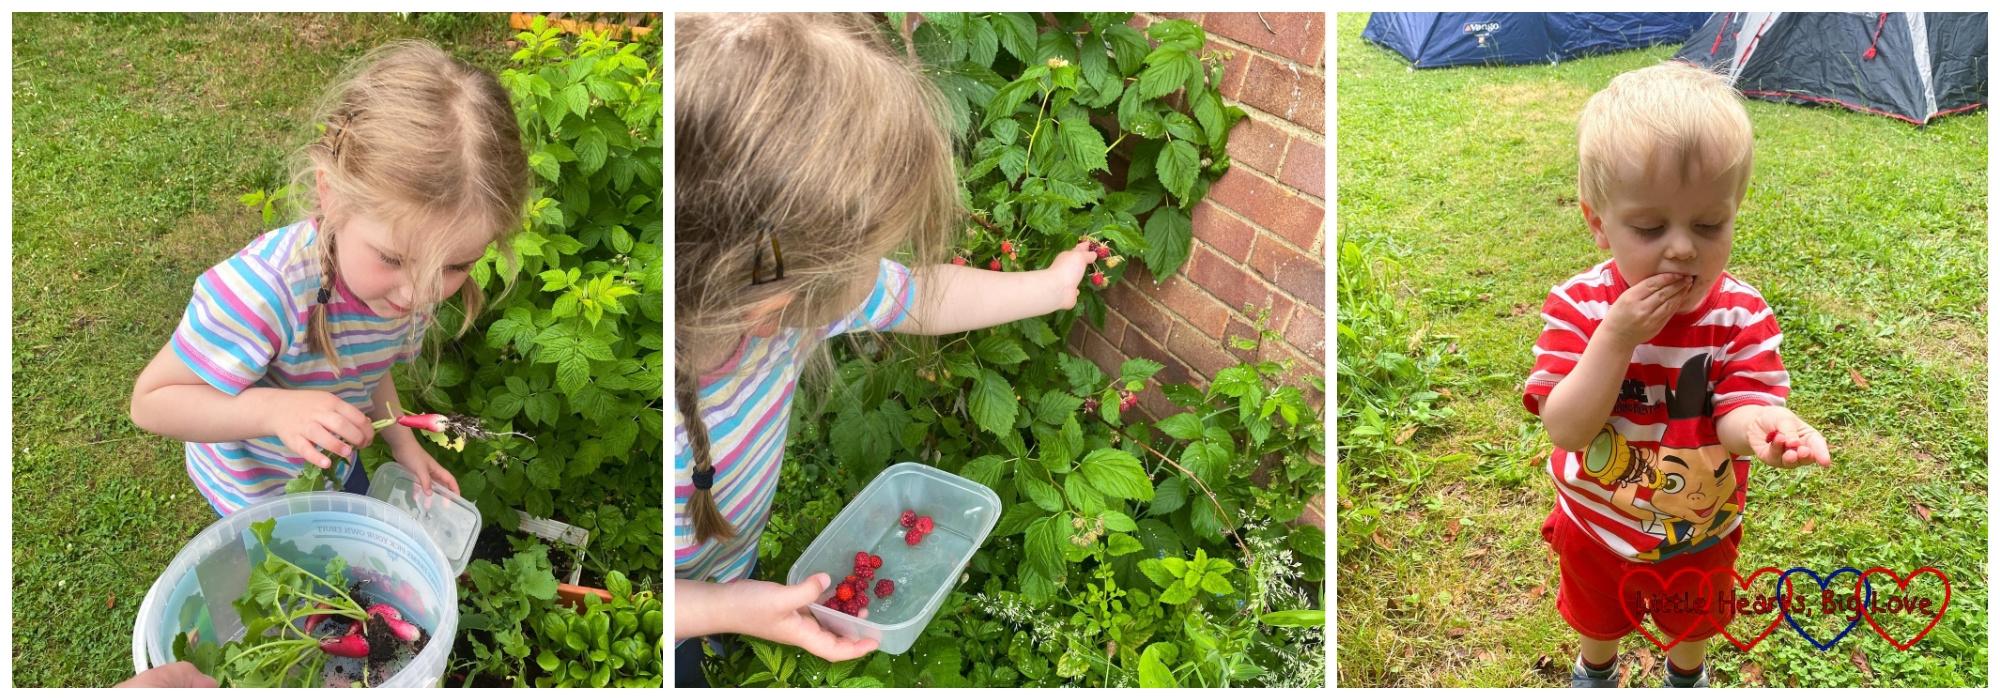 Sophie picking radishes; Sophie picking raspberries; Thomas eating raspberries